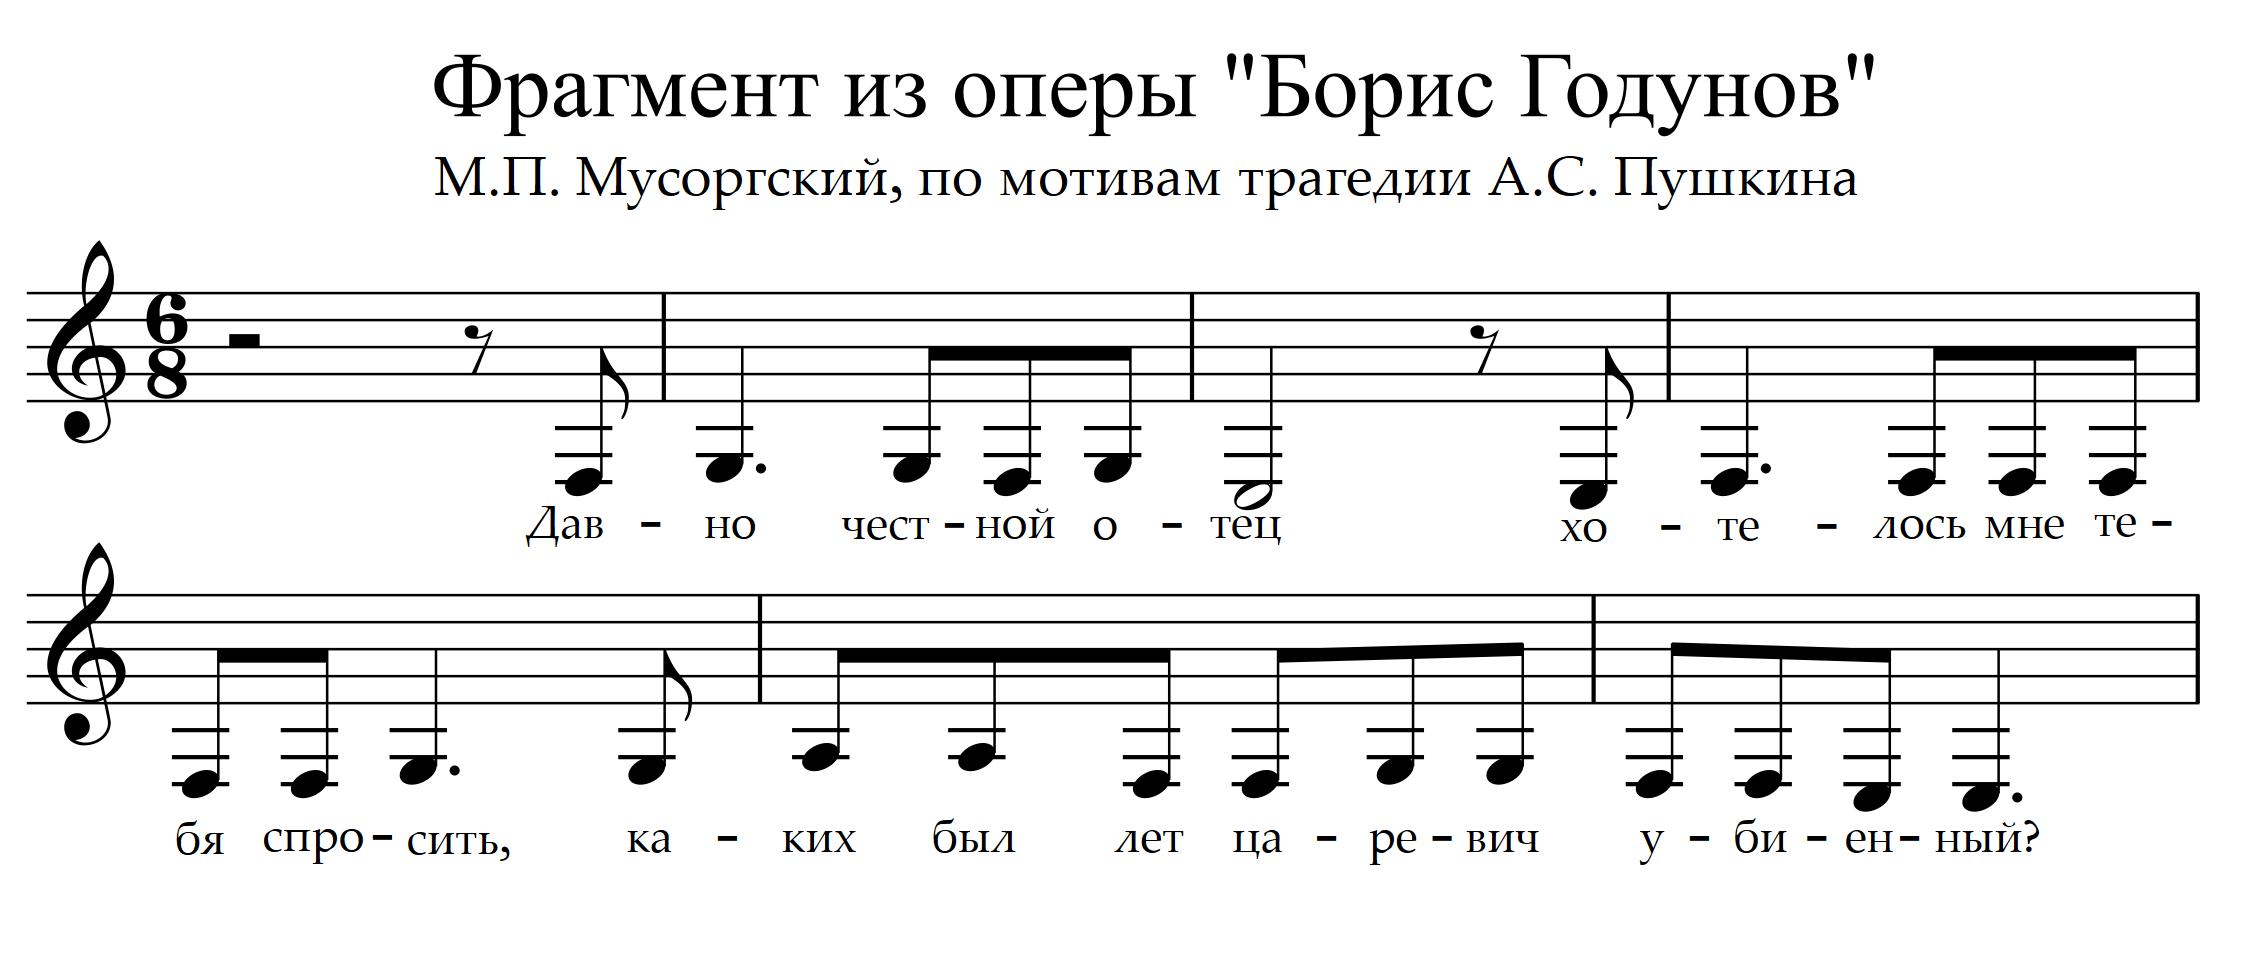 28 Godunov